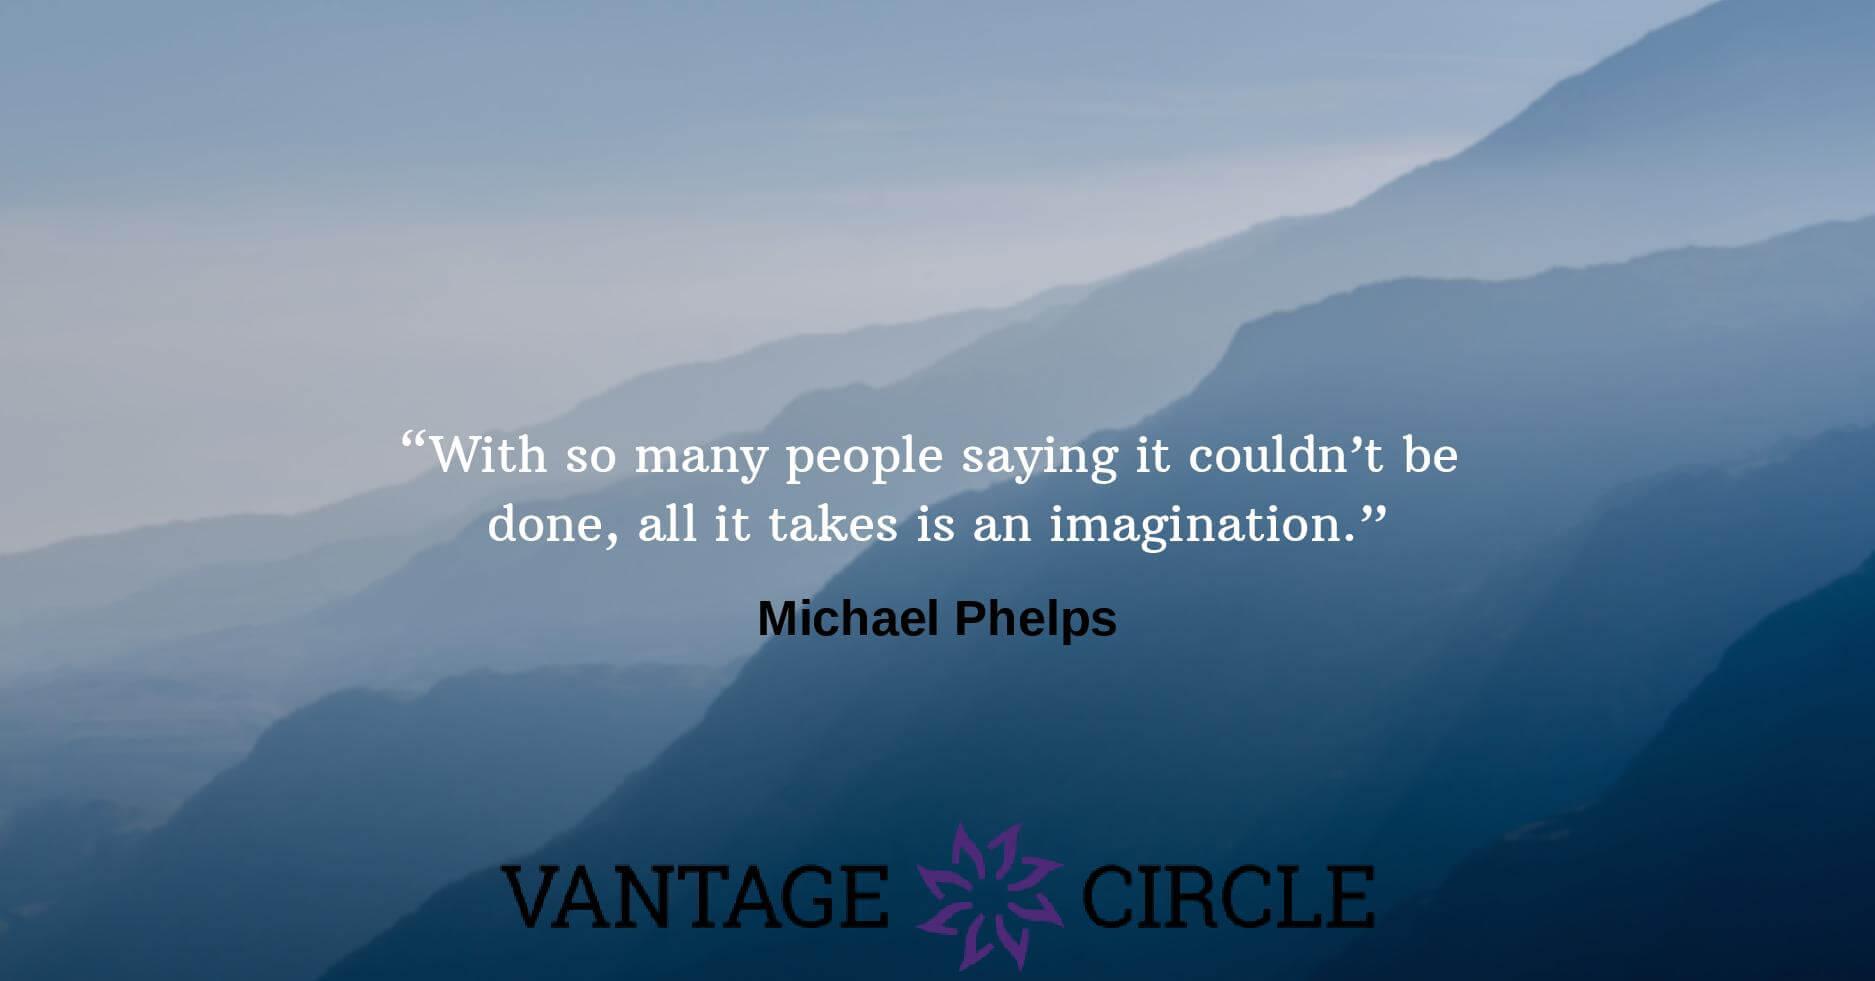 Employee-motivational-quotes-Michael-Phelps